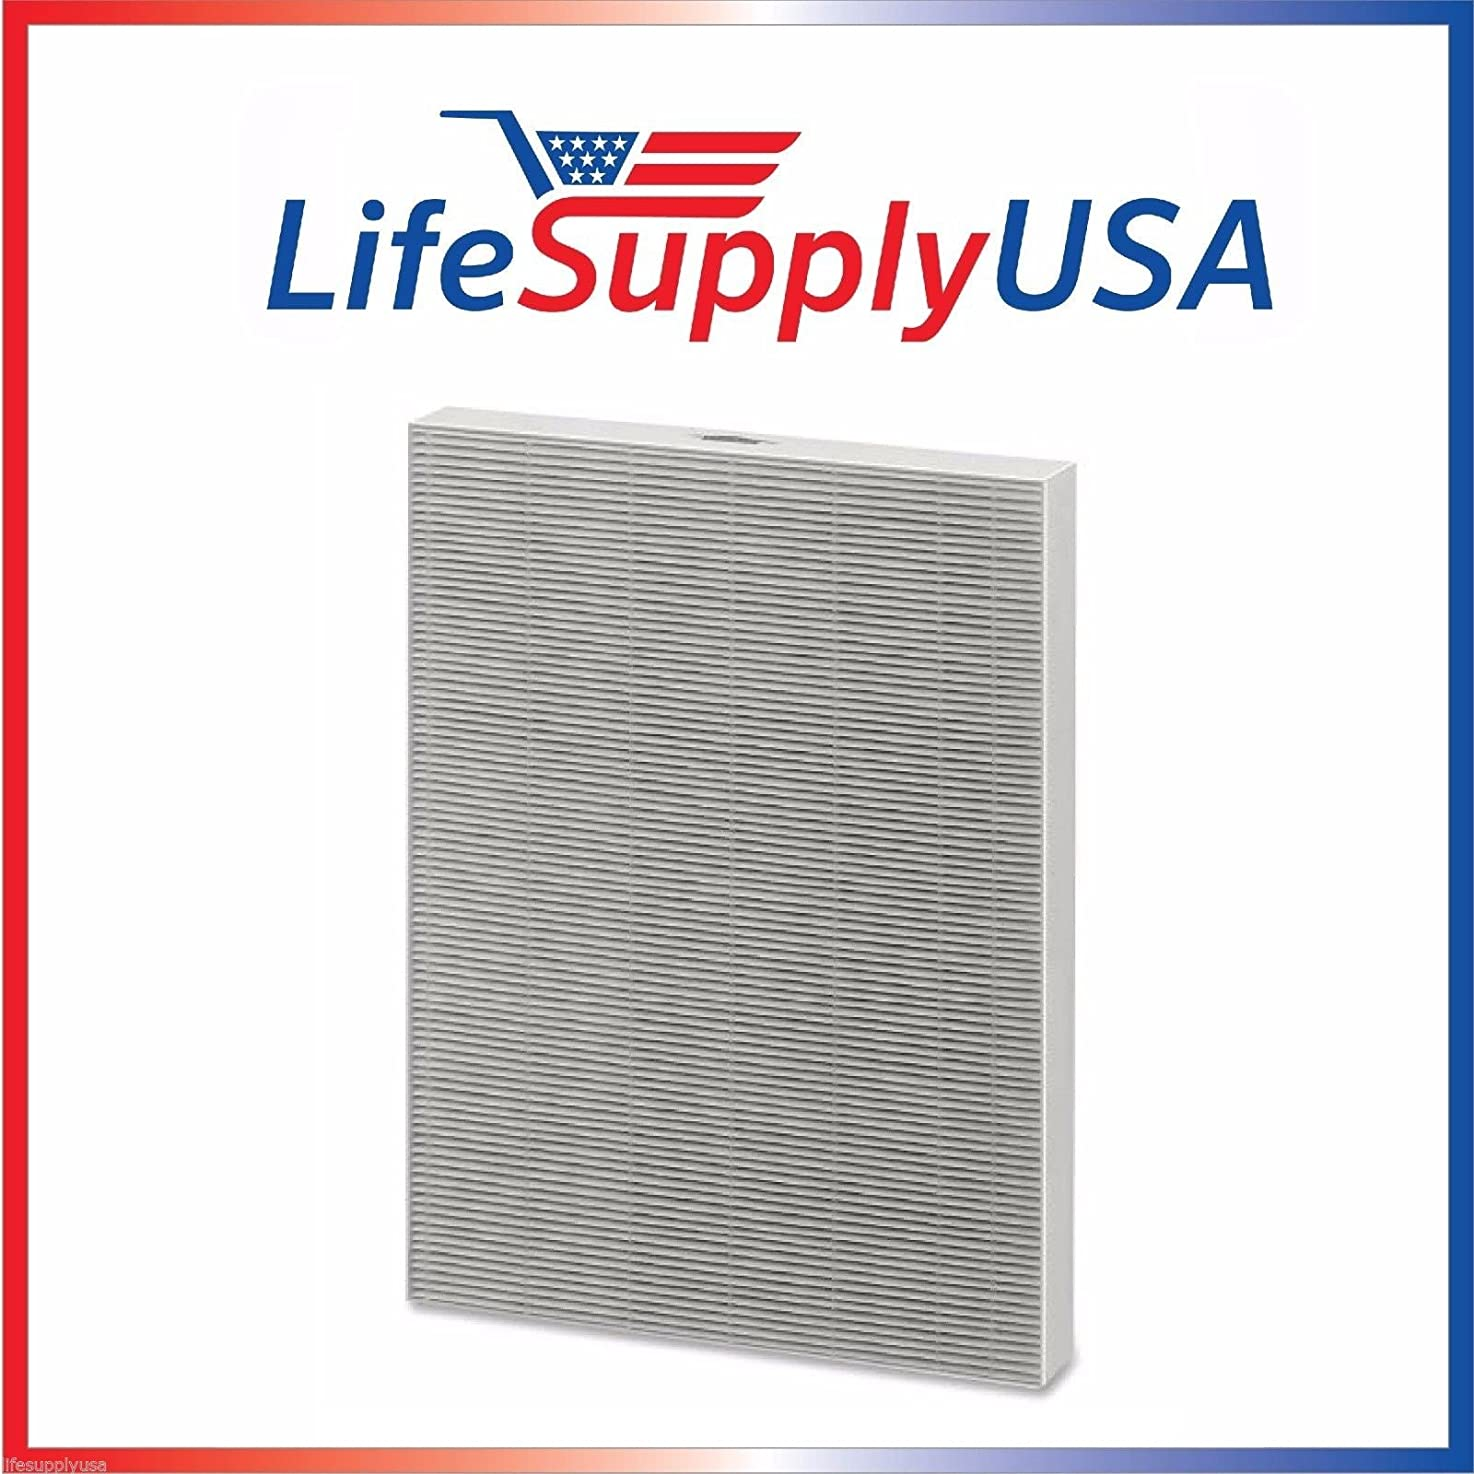 LifeSupplyUSA 1 HEPA Air Purifier Filter for Winix 115115 / PlasmaWave, Size 21